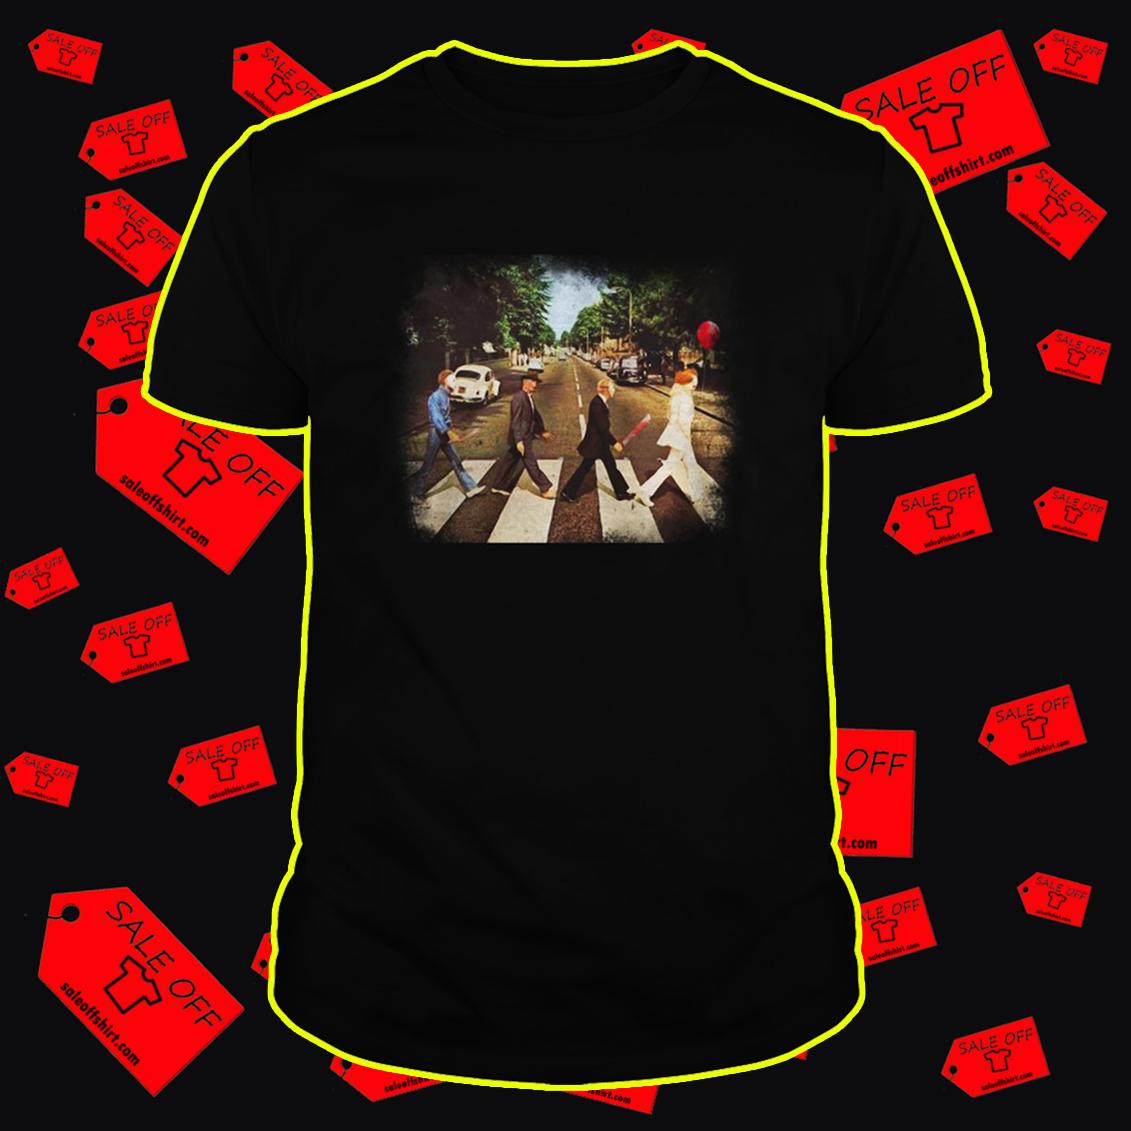 Abbey road Pennywise Michael Myers Freddy Krueger Jason Voorhees shirt